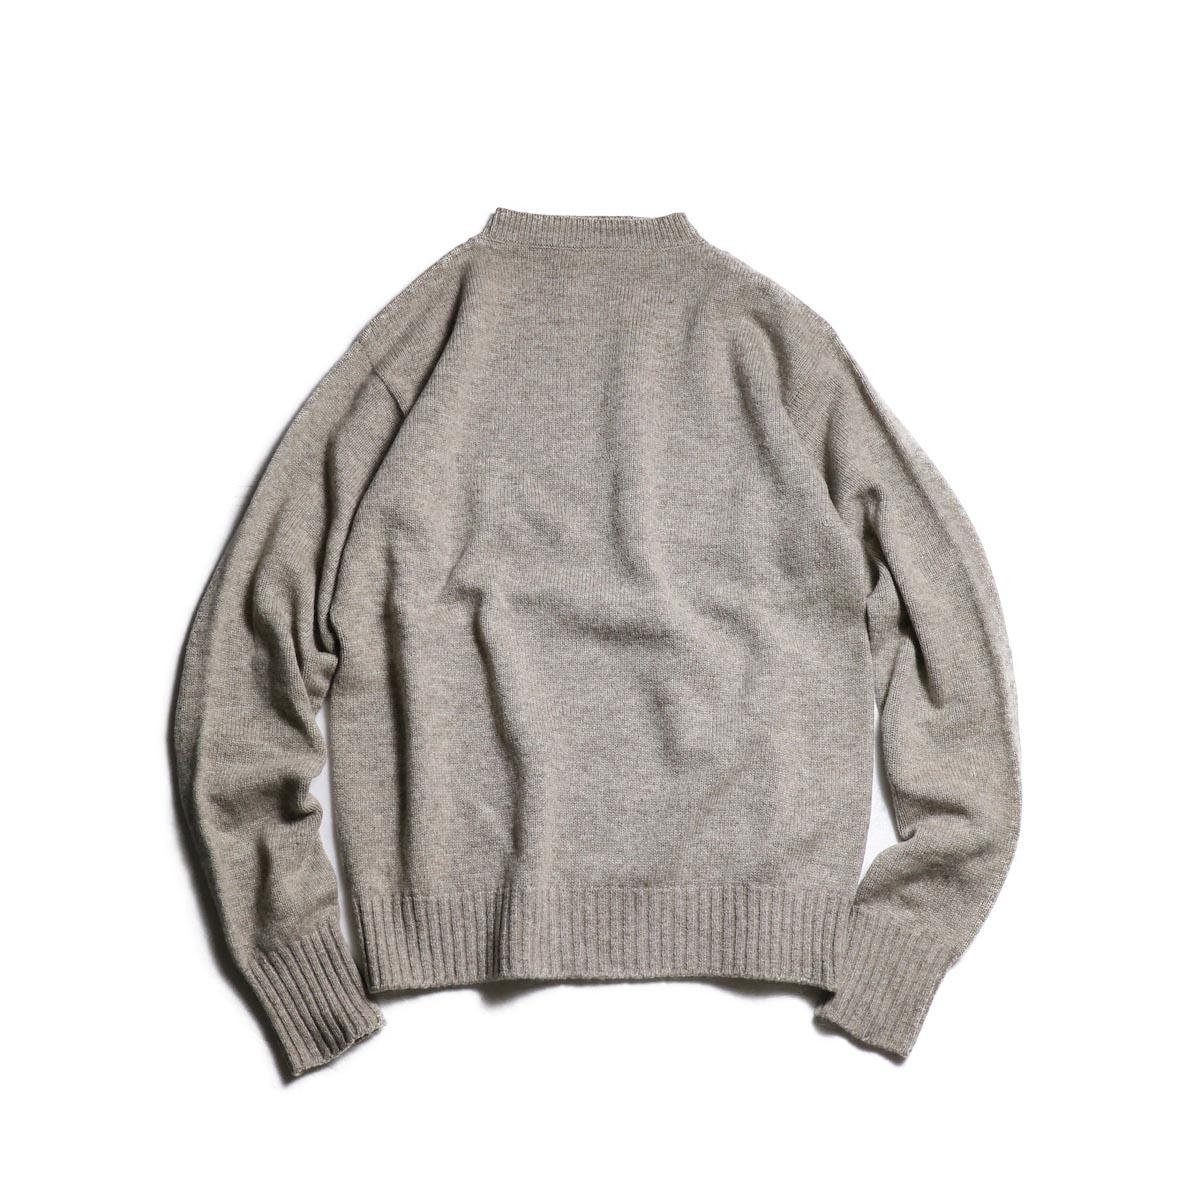 Kaptain Sunshine / Black Melino Crewneck Seemless P/O Sweater